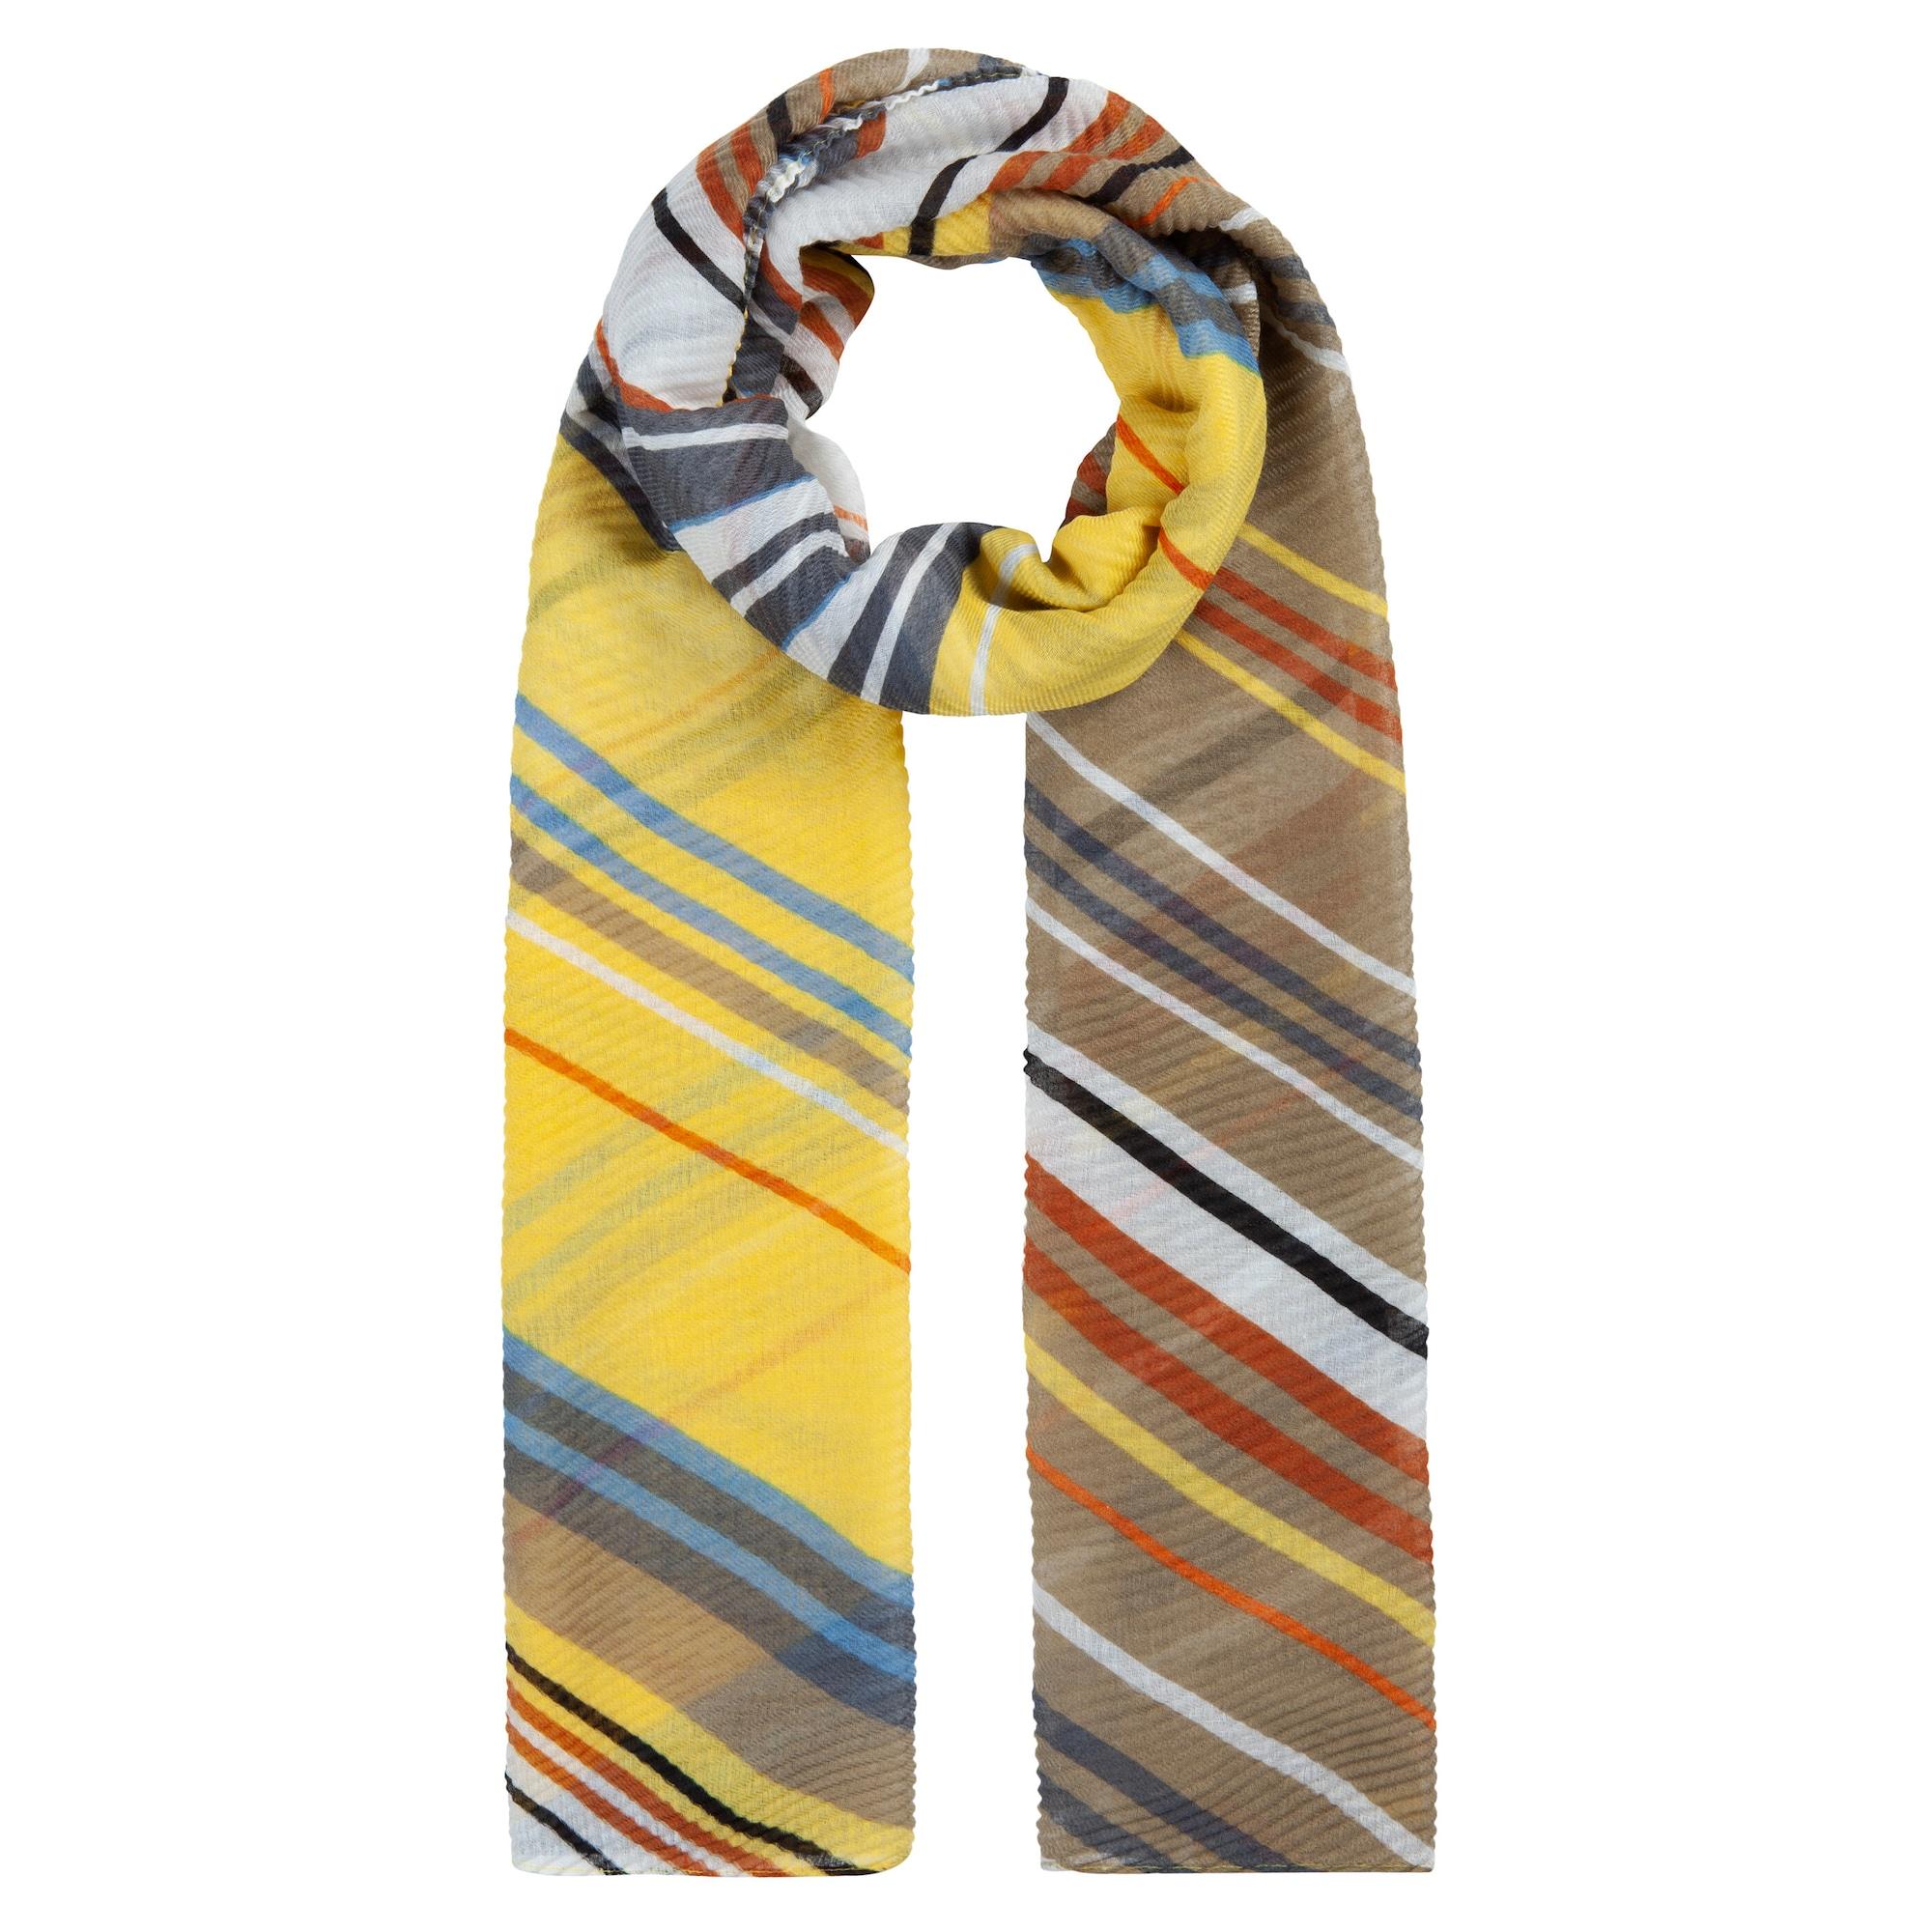 CODELLO Šalikas geltona / ruda / balta / mėlyna / pilka